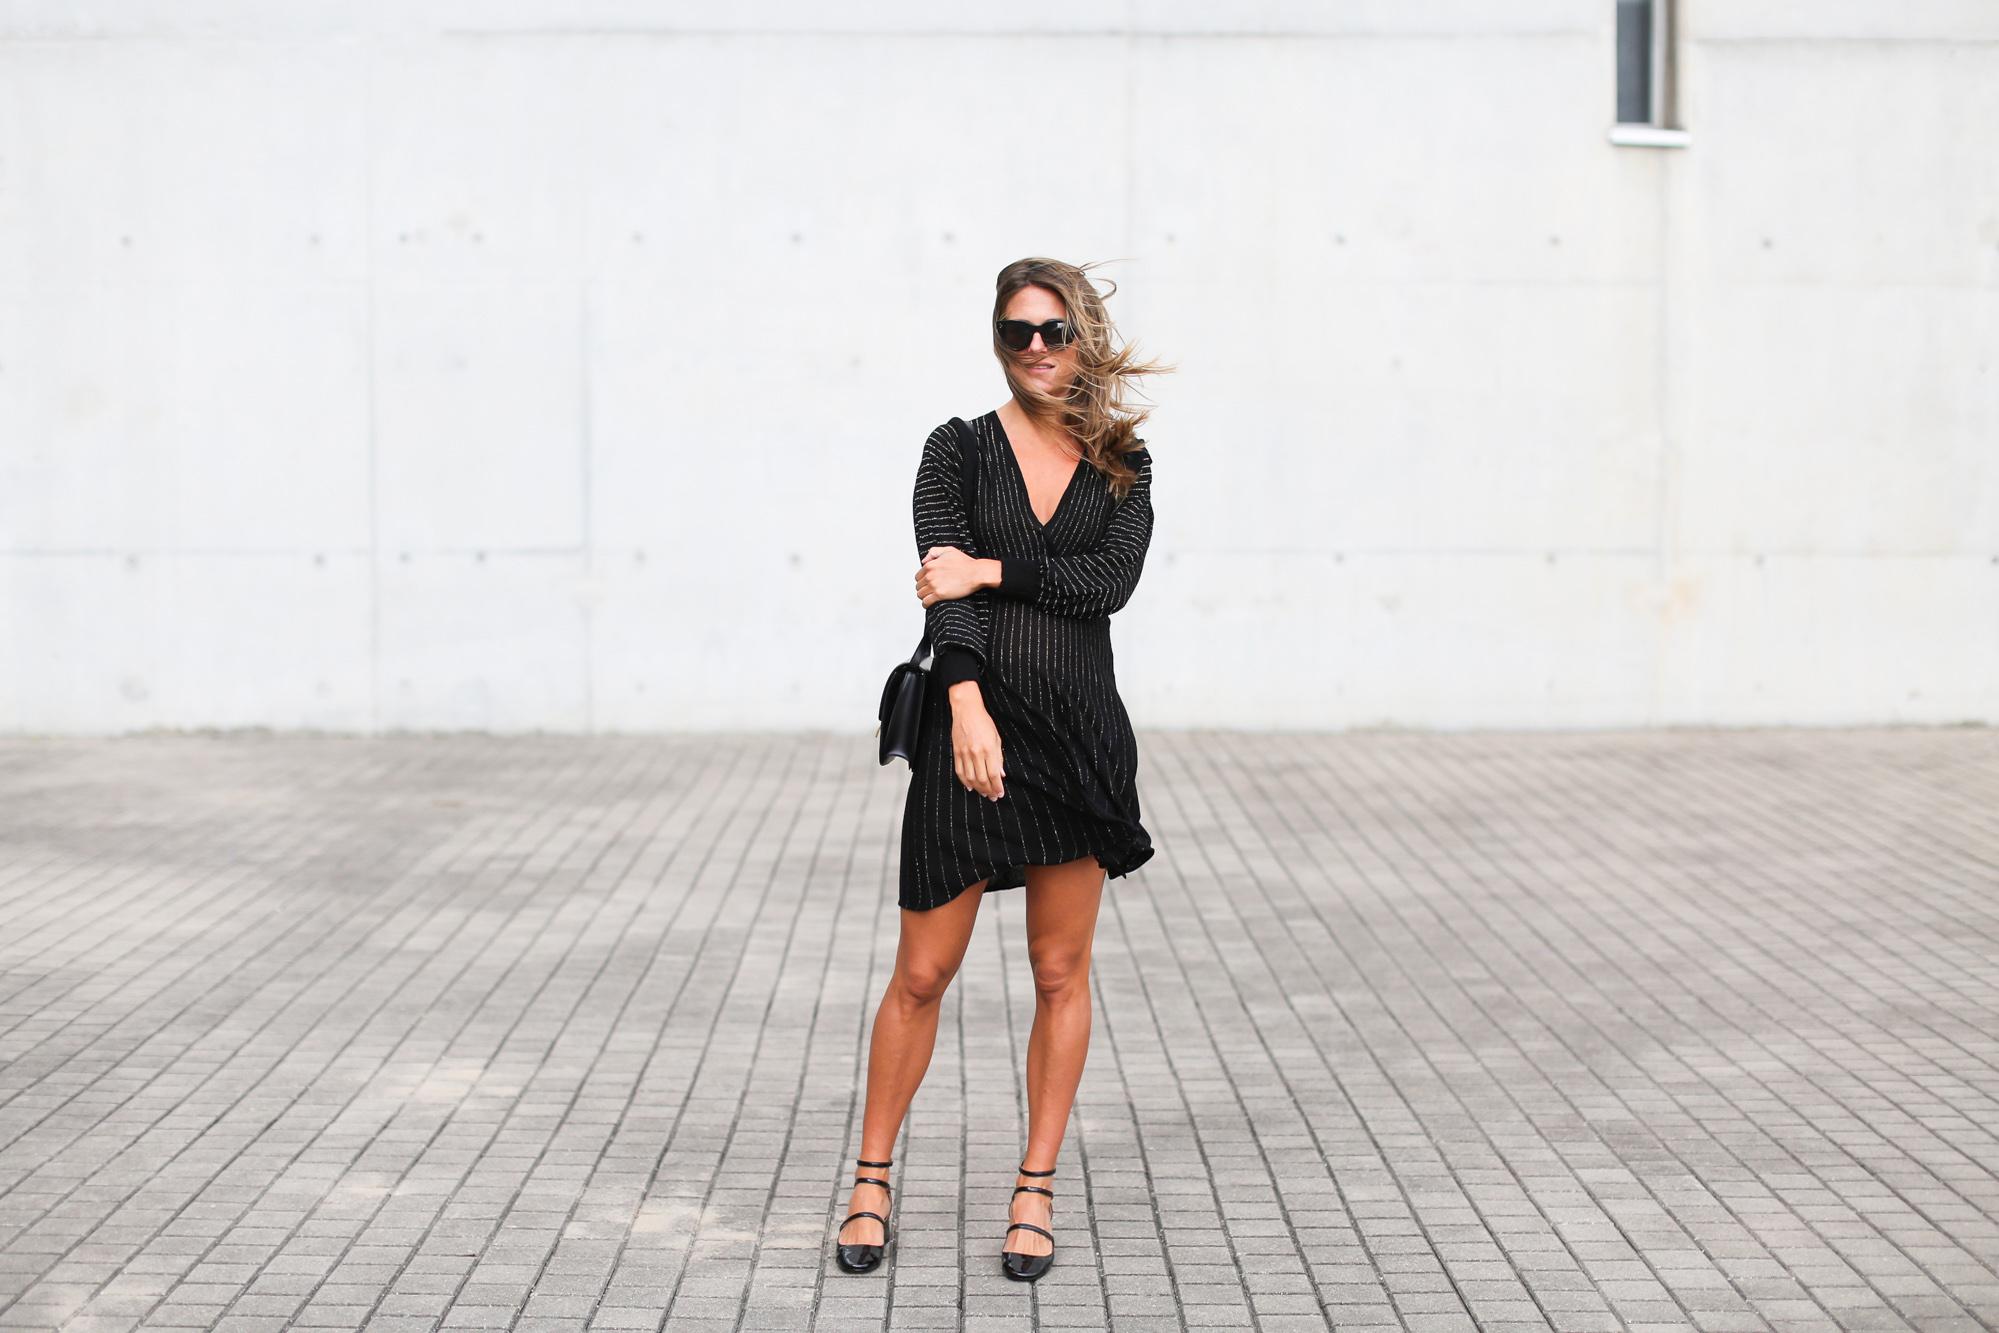 Clochet_streetstyle_fashionblogger_zaraknitdress_specialedition_celineboxbag_celinesunglasses